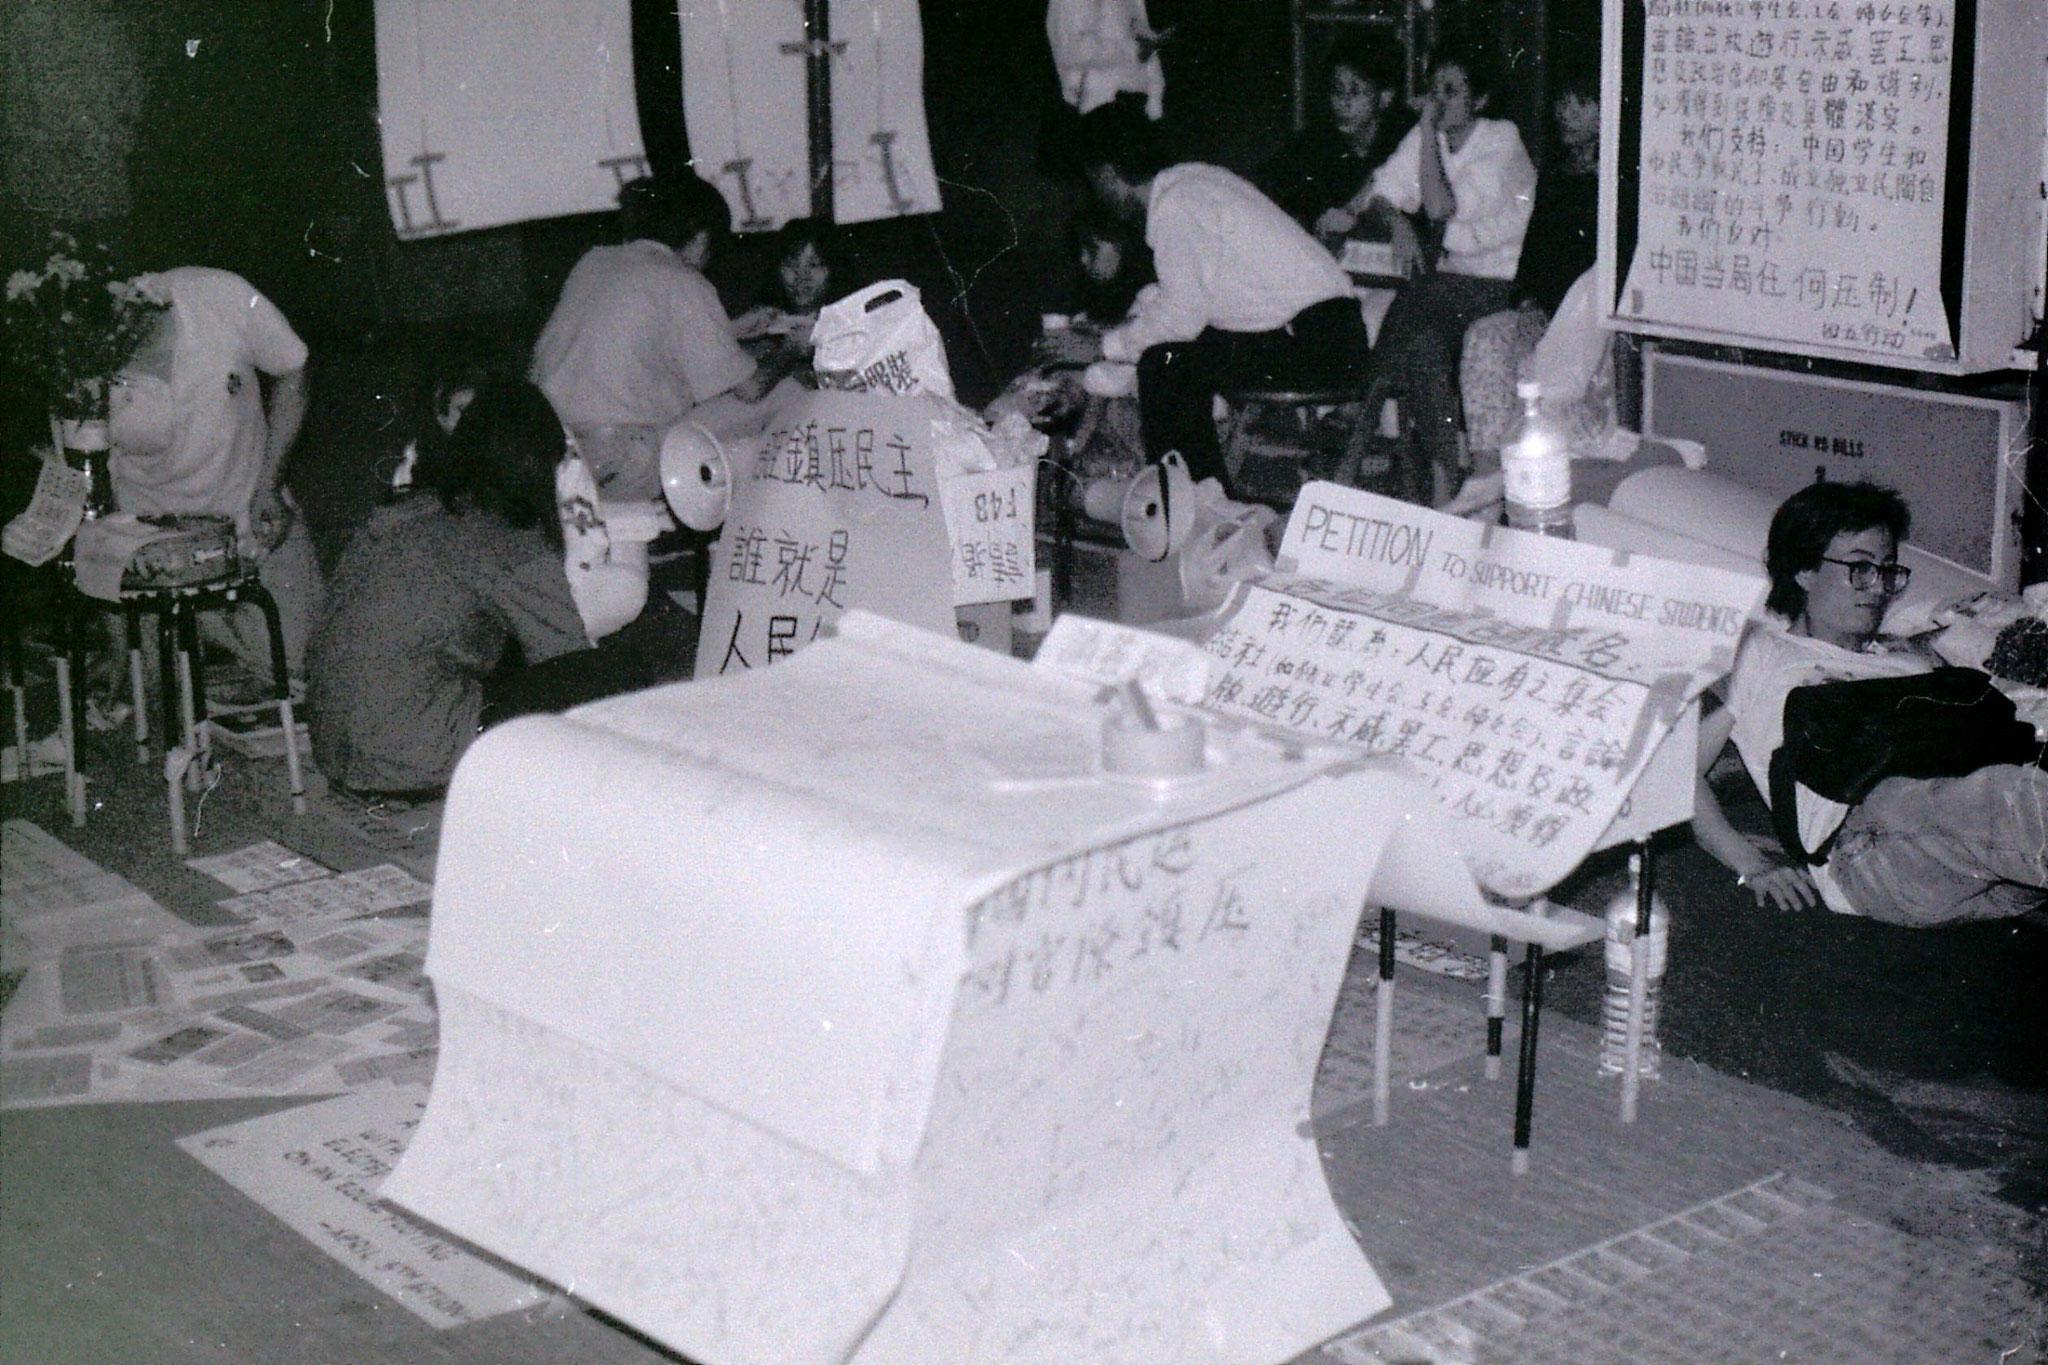 /1989: Hong Kong: